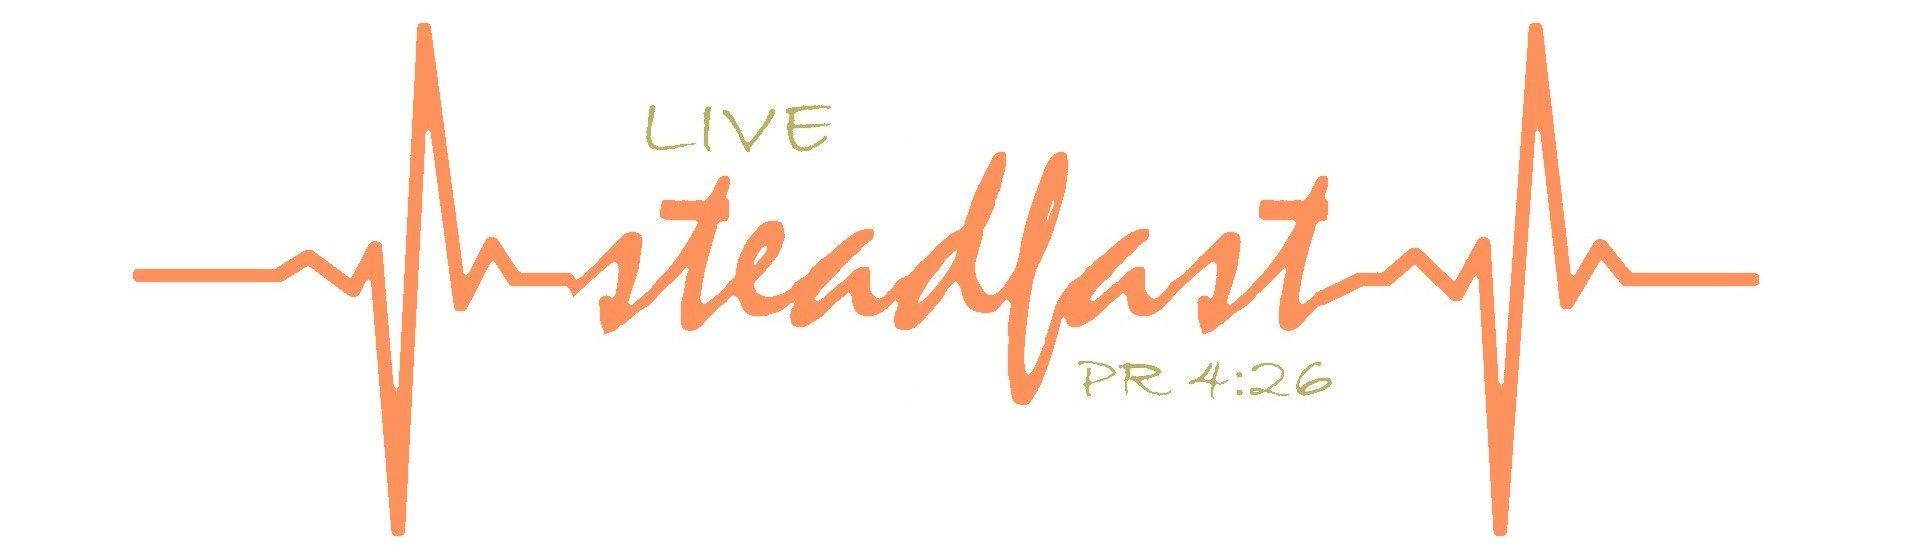 Live Steadfast